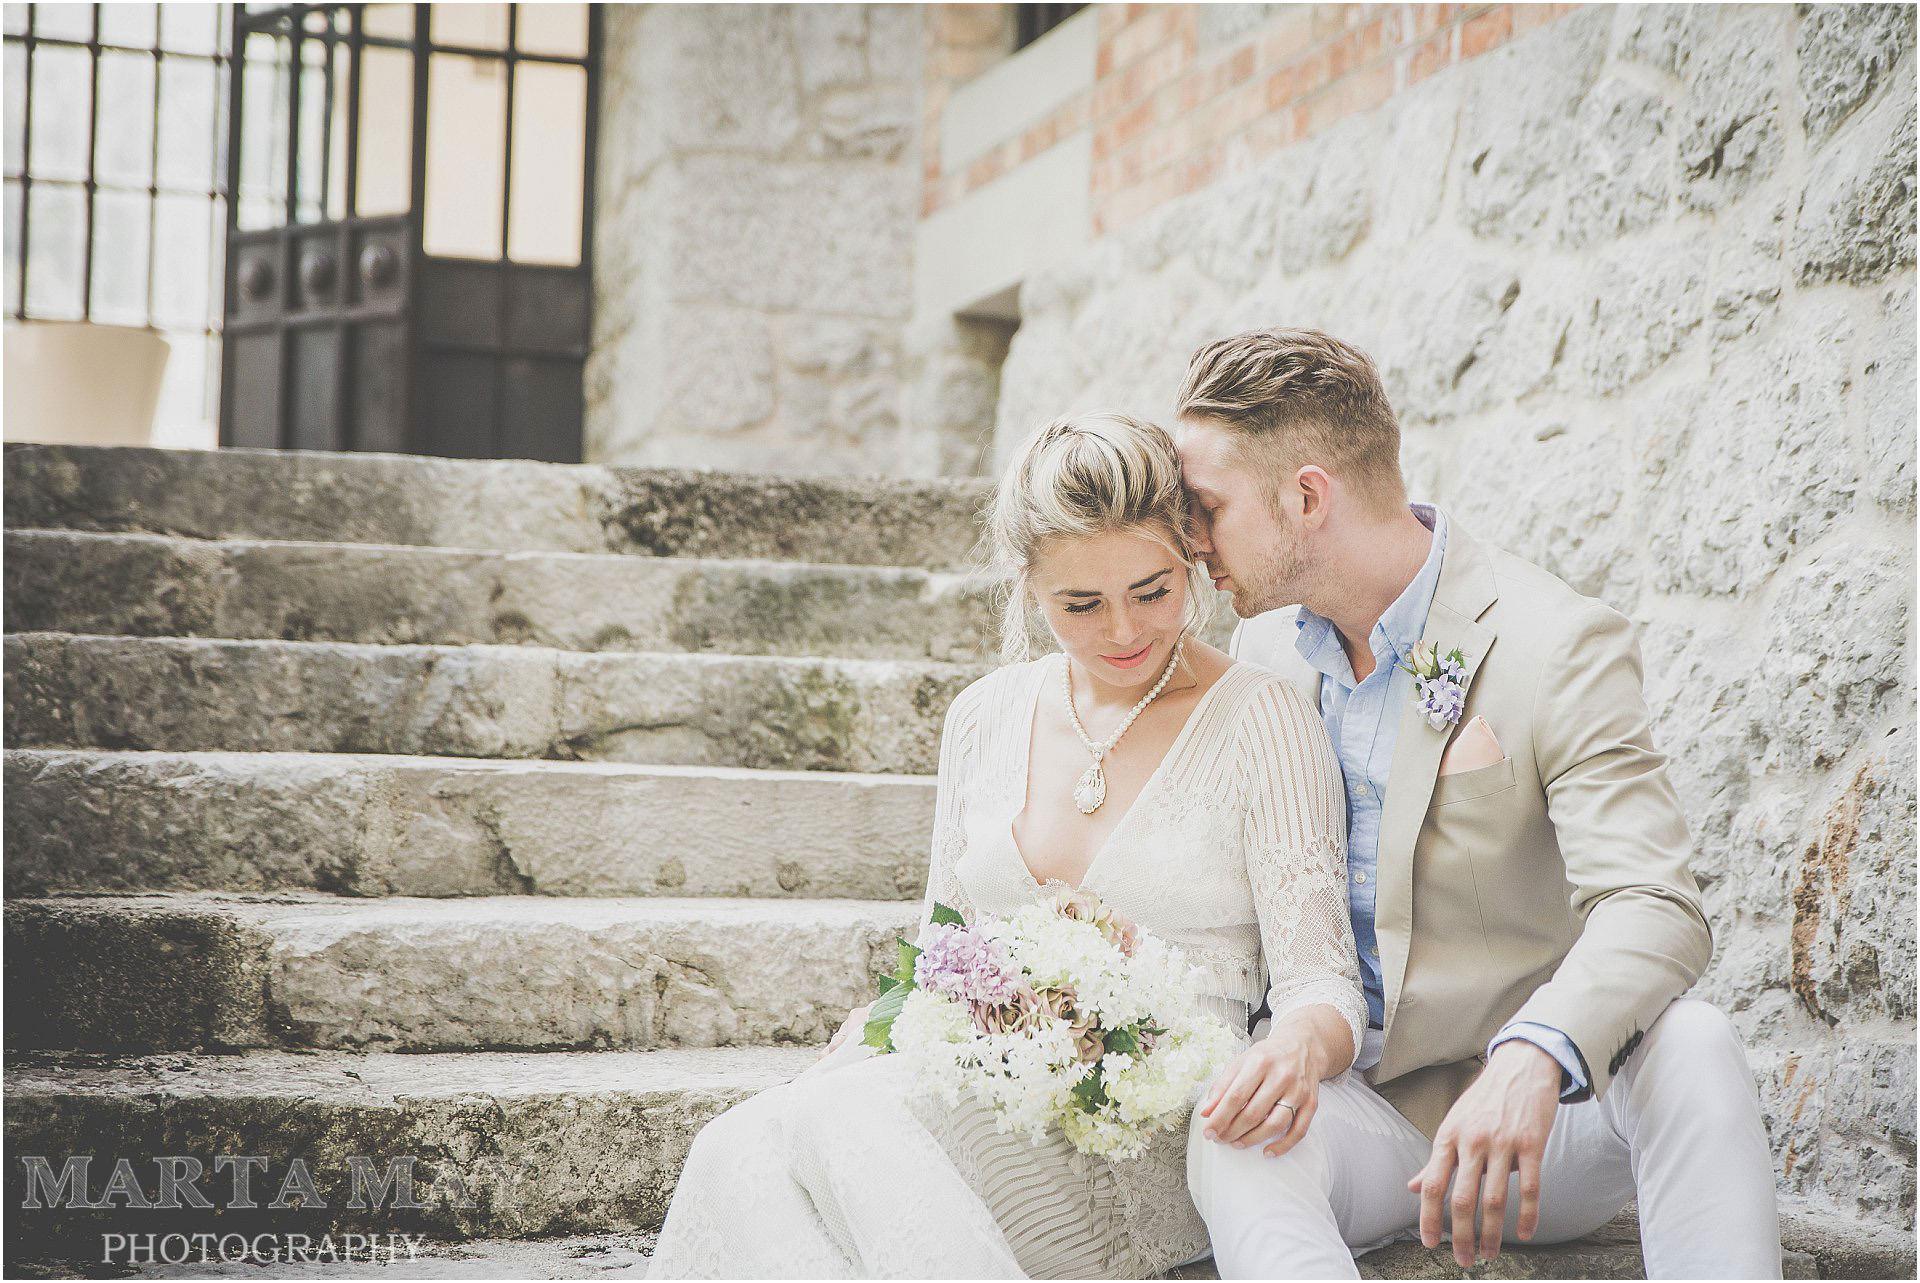 Count Ceconi Castle love story